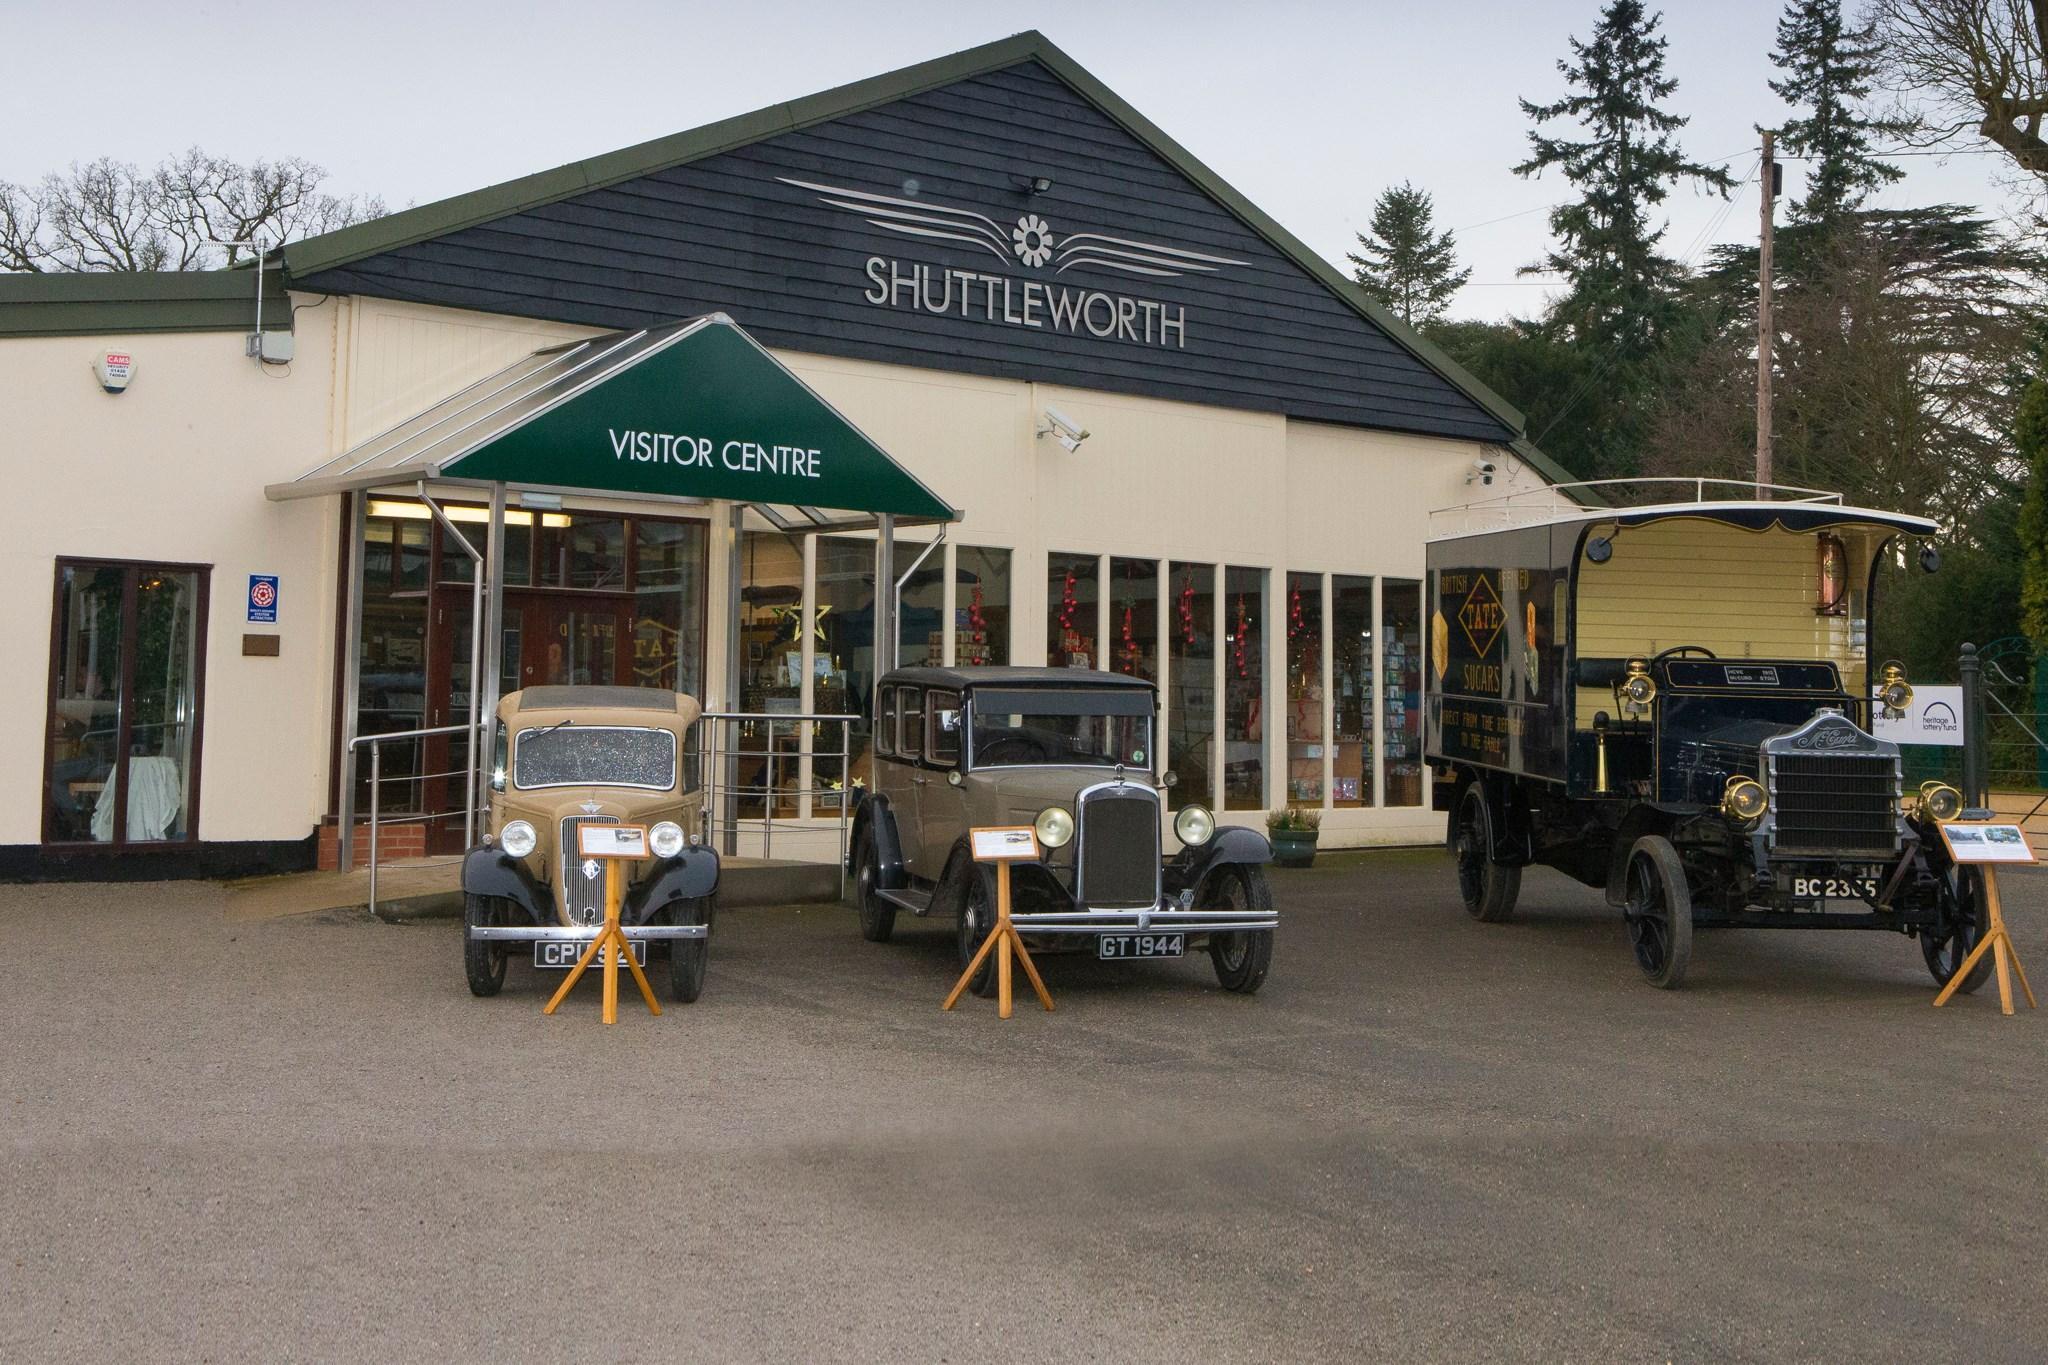 Shuttleworth Visitor Centre